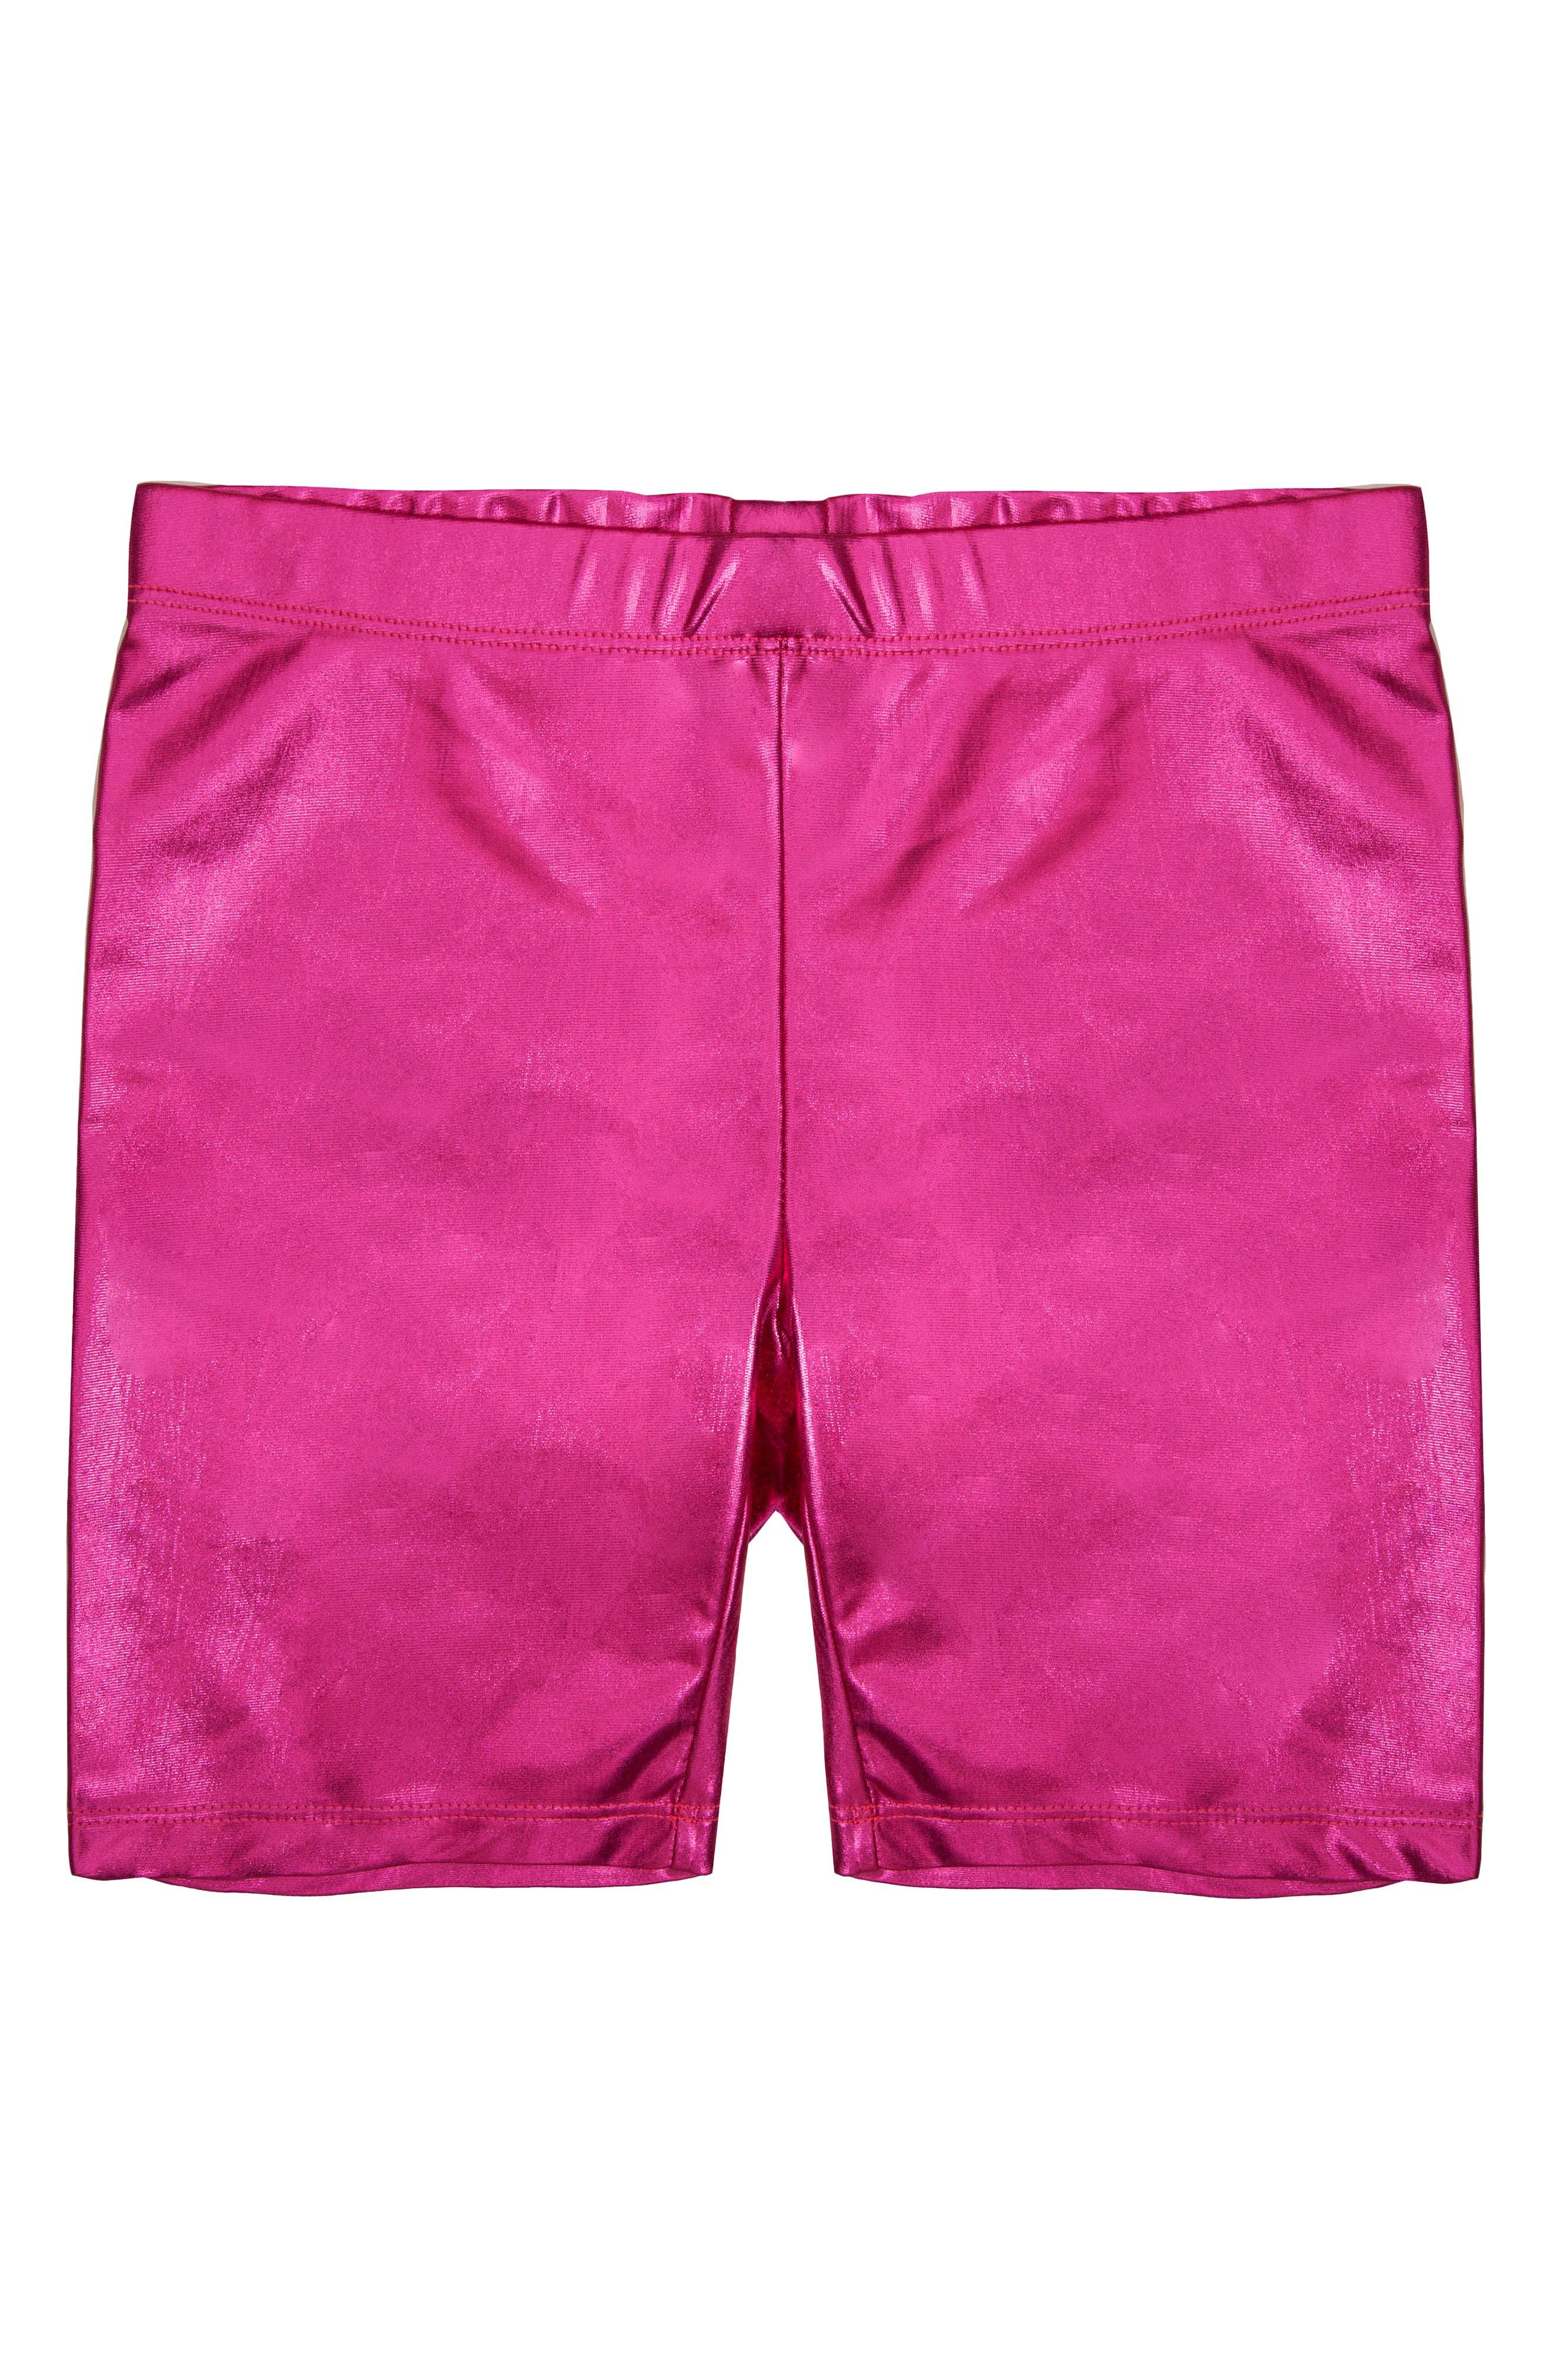 MIA New York Girl's Mia New York Bike Shorts, Size L - Pink